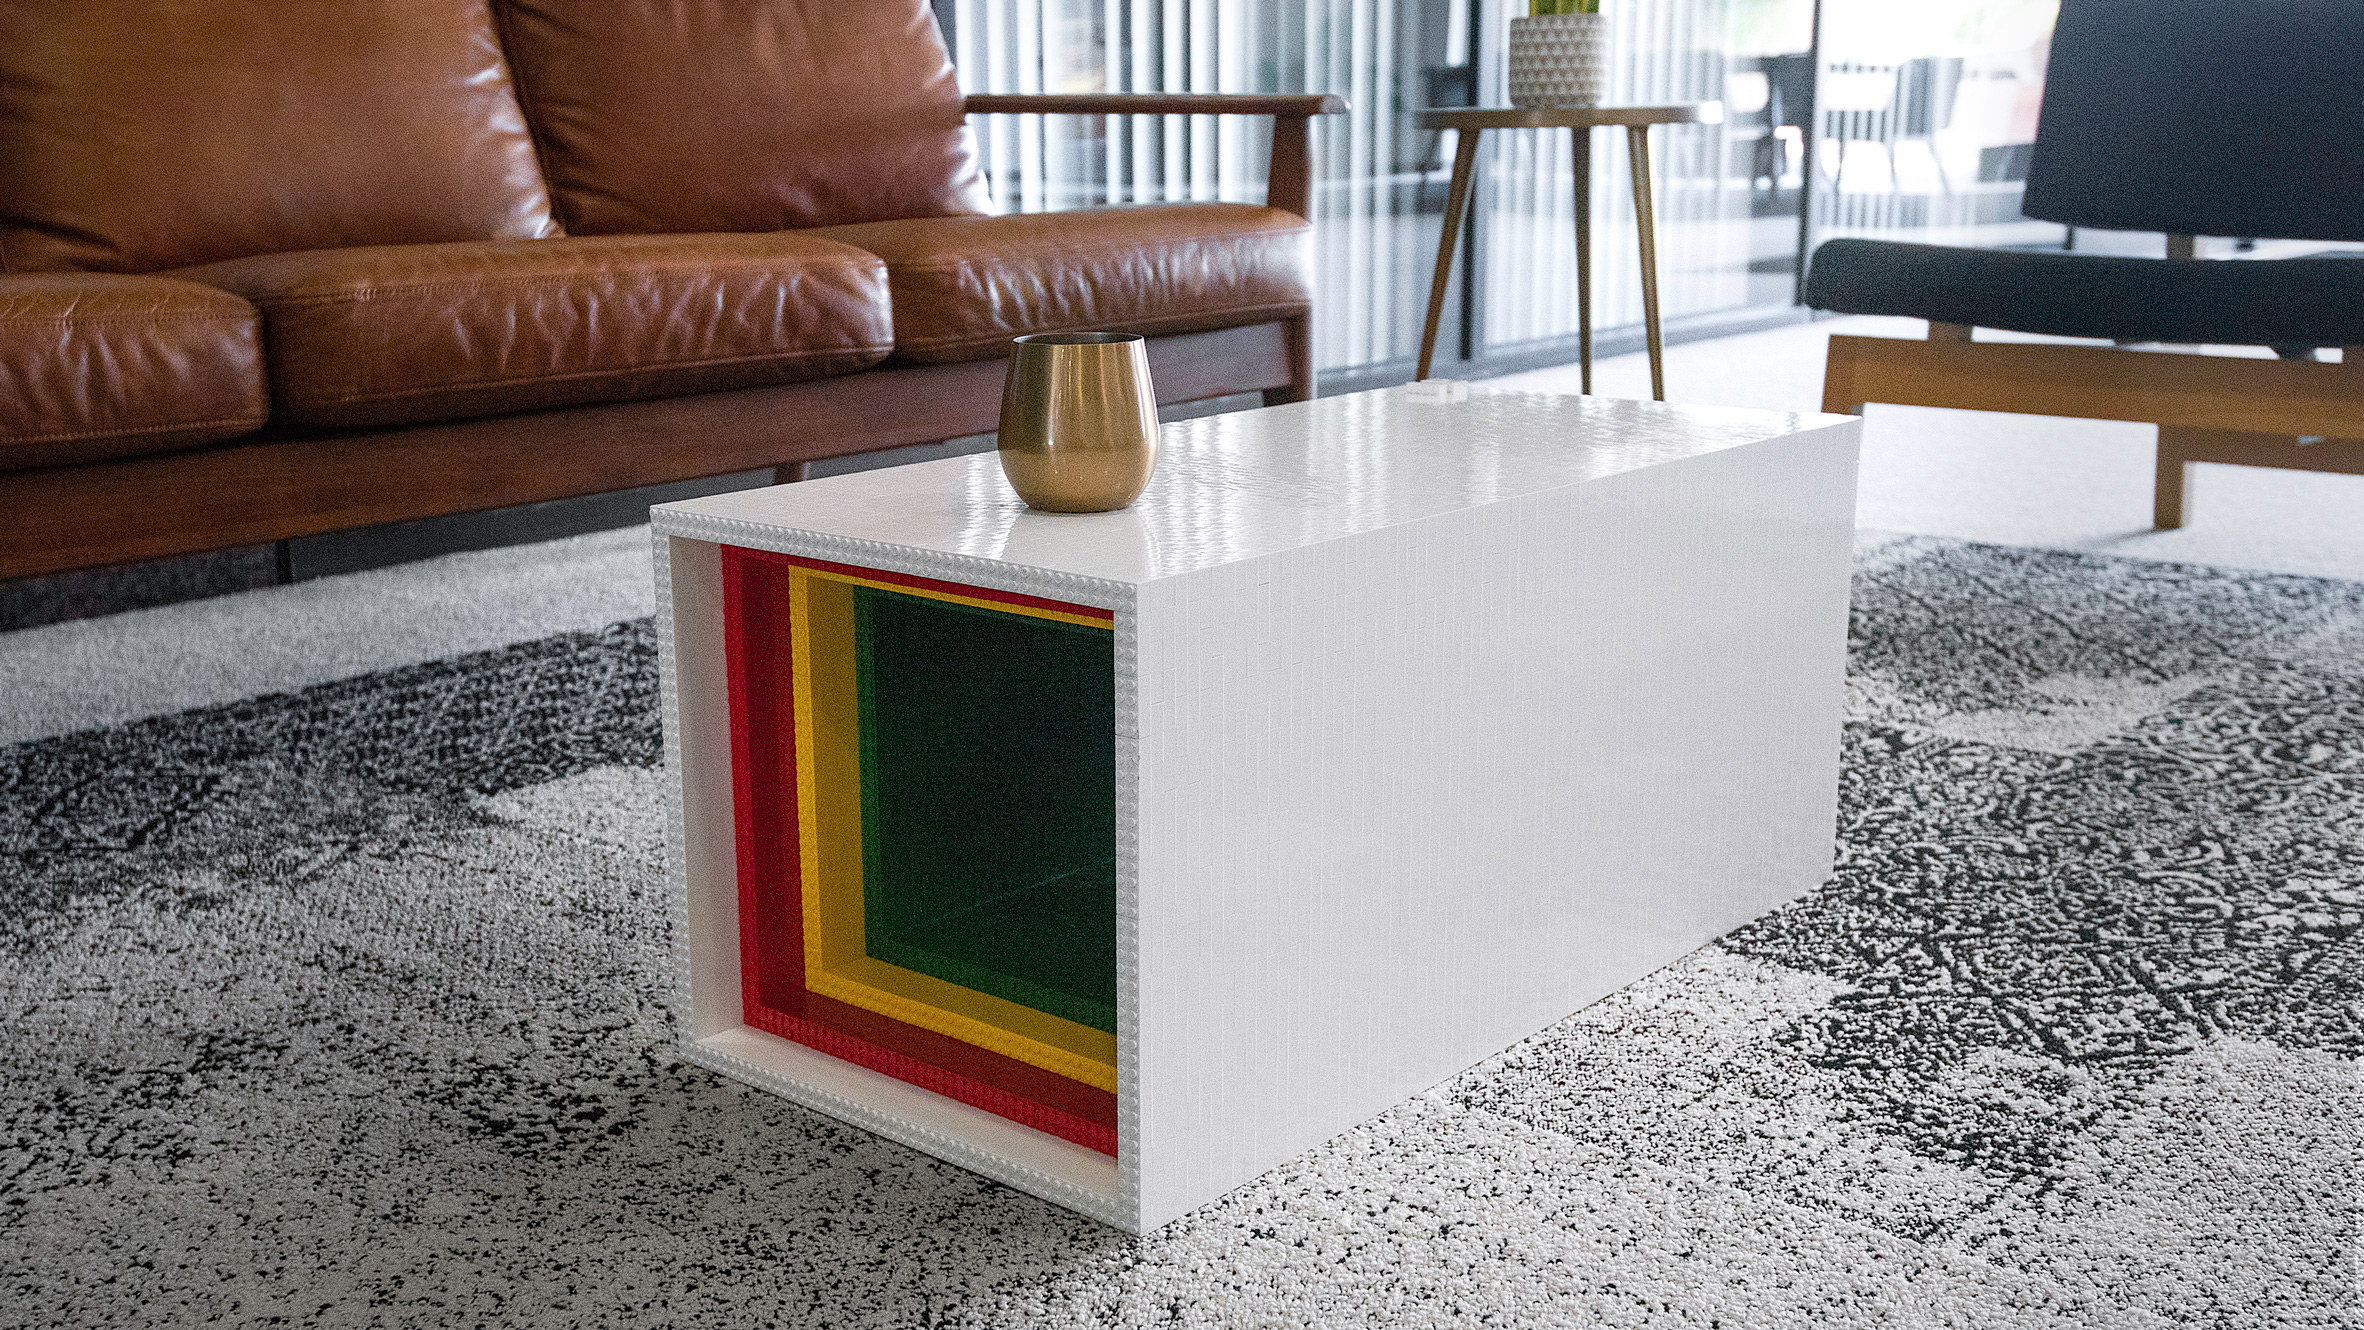 Lego Table by Yusong Zhang